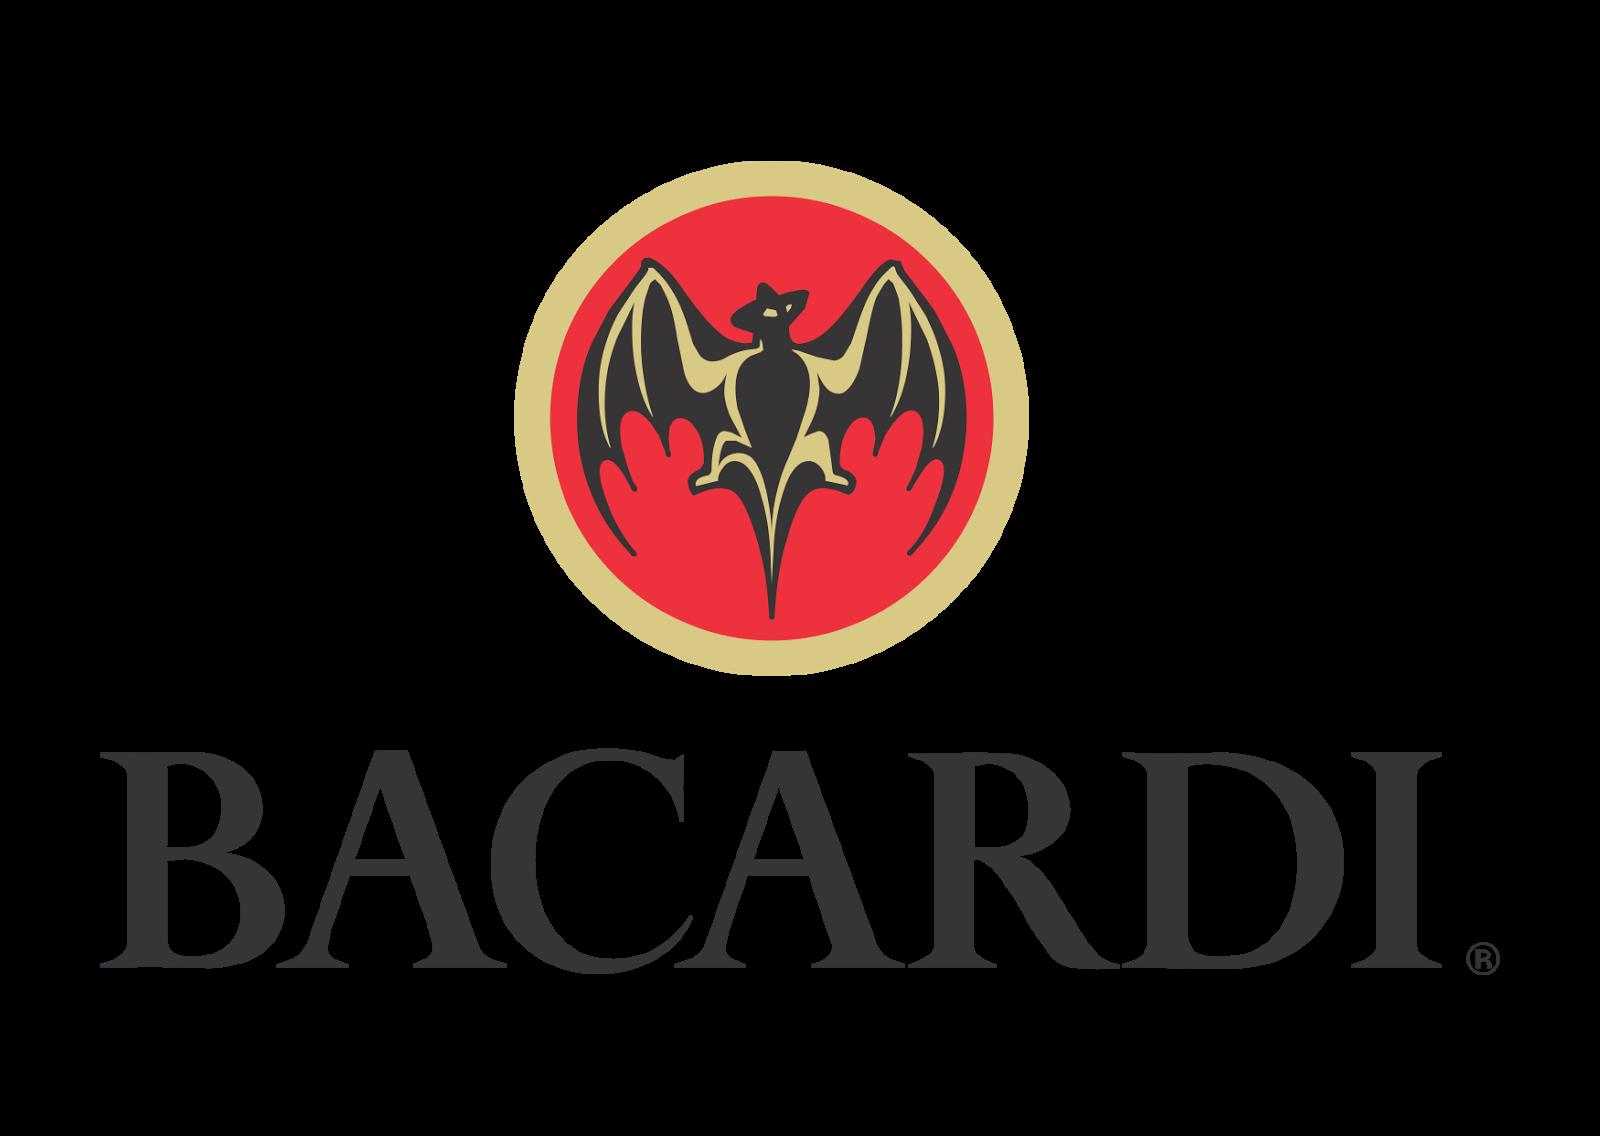 Bacardi Logo Vector - Bacardi PNG